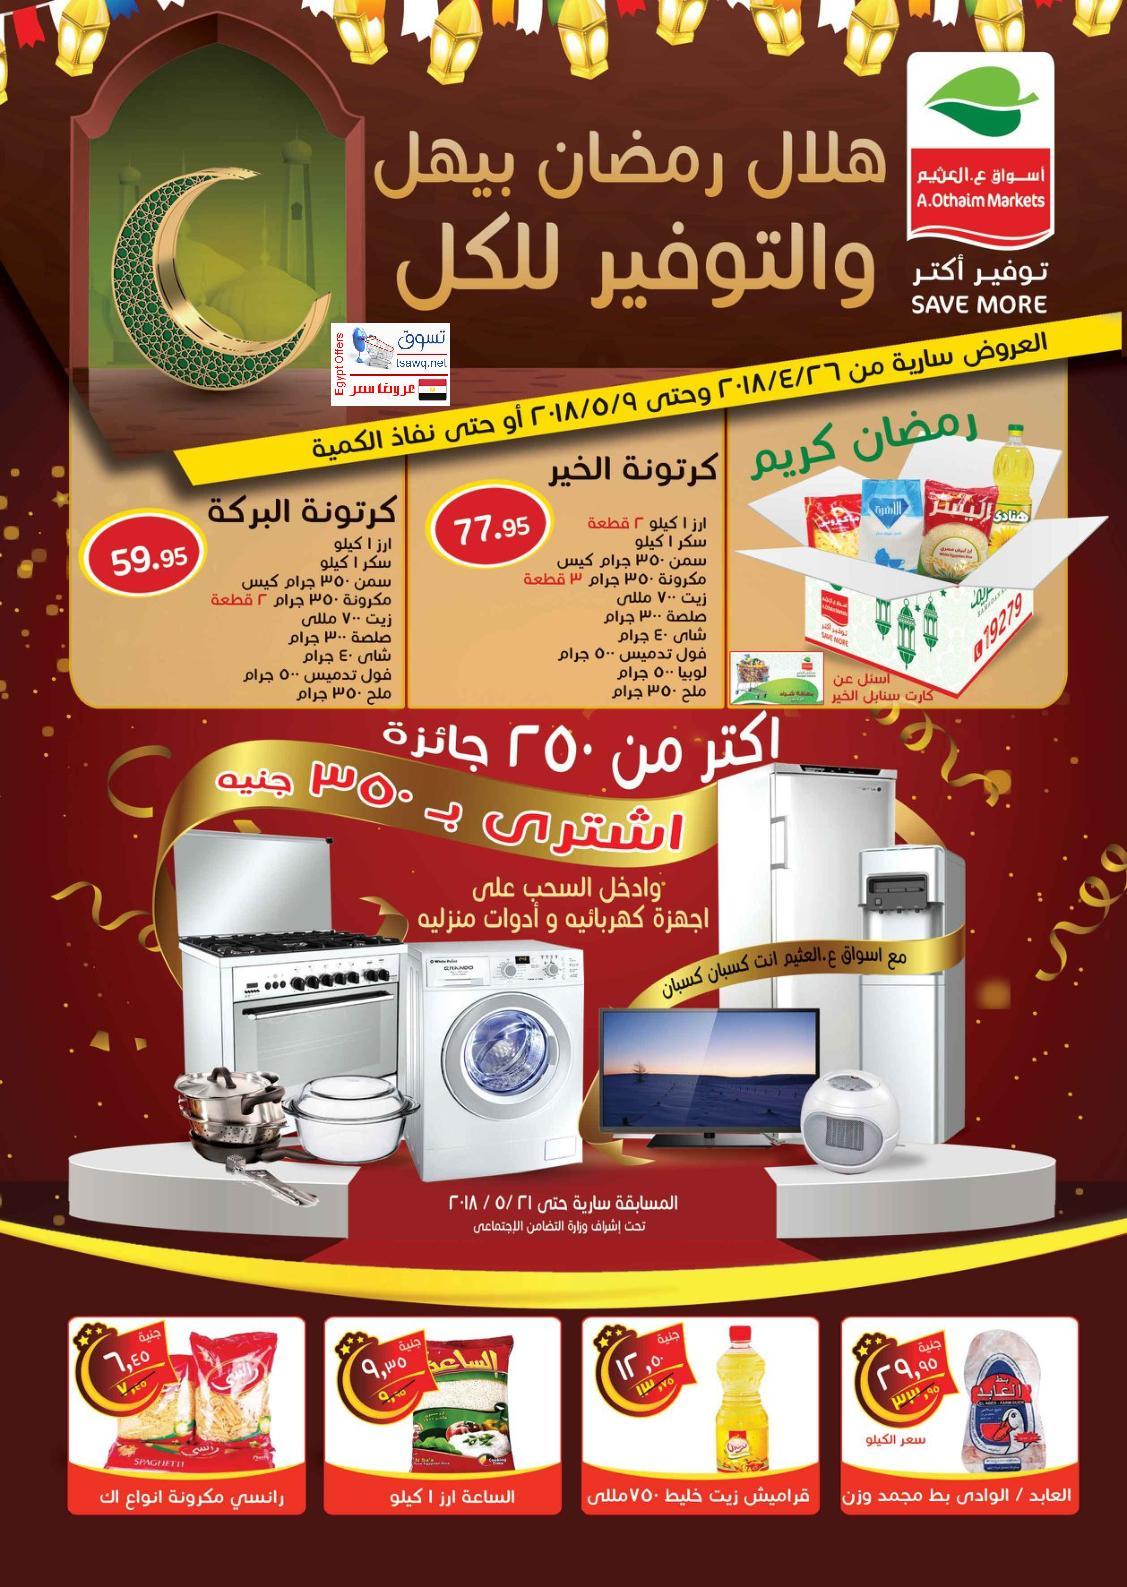 1222b2095 عروض أسواق العثيم مصر من 26 إبريل حتى 9 مايو 2018 رمضان   تسوق نت